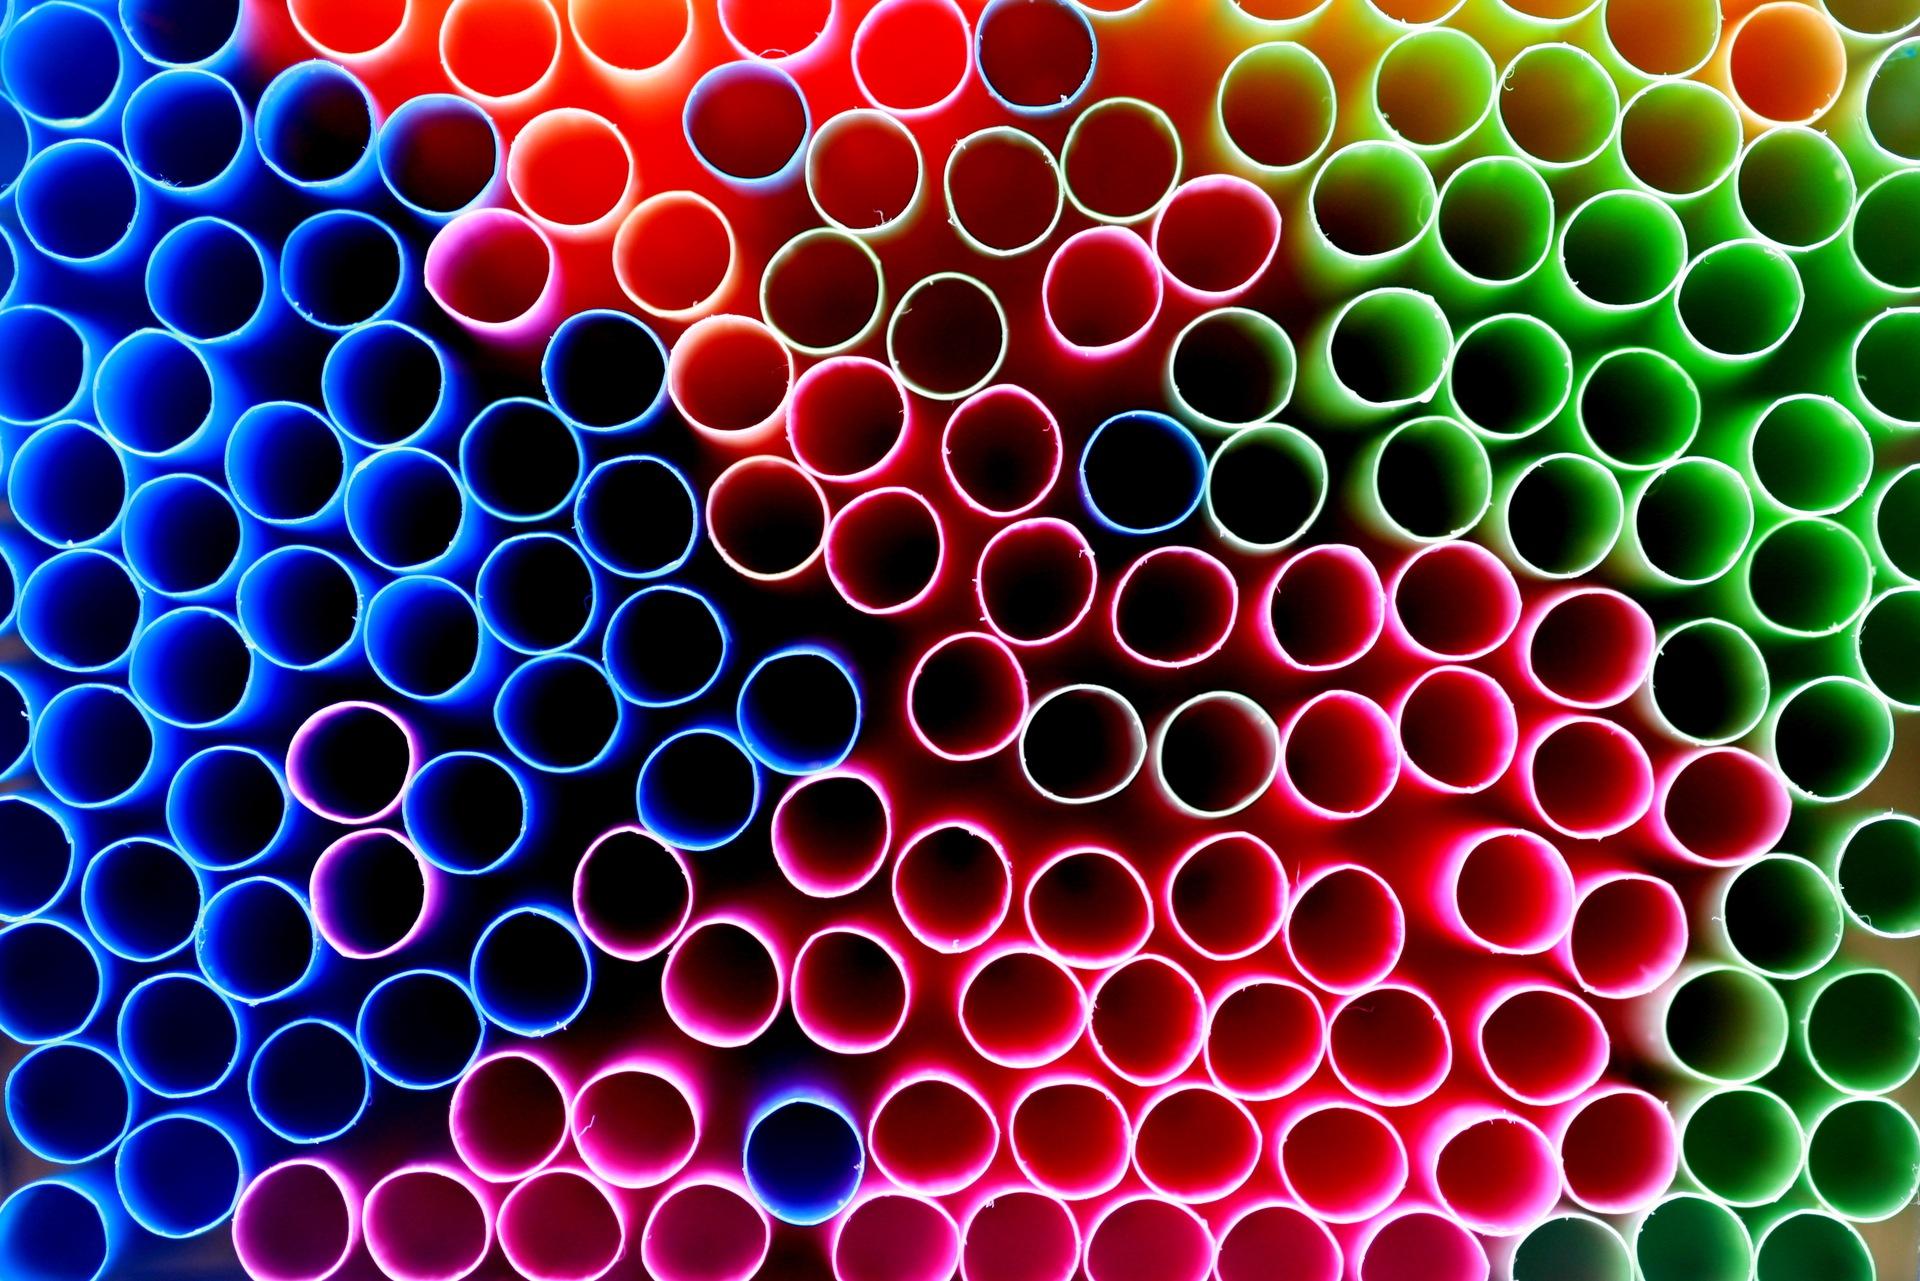 colores fondos de escritorio - photo #27